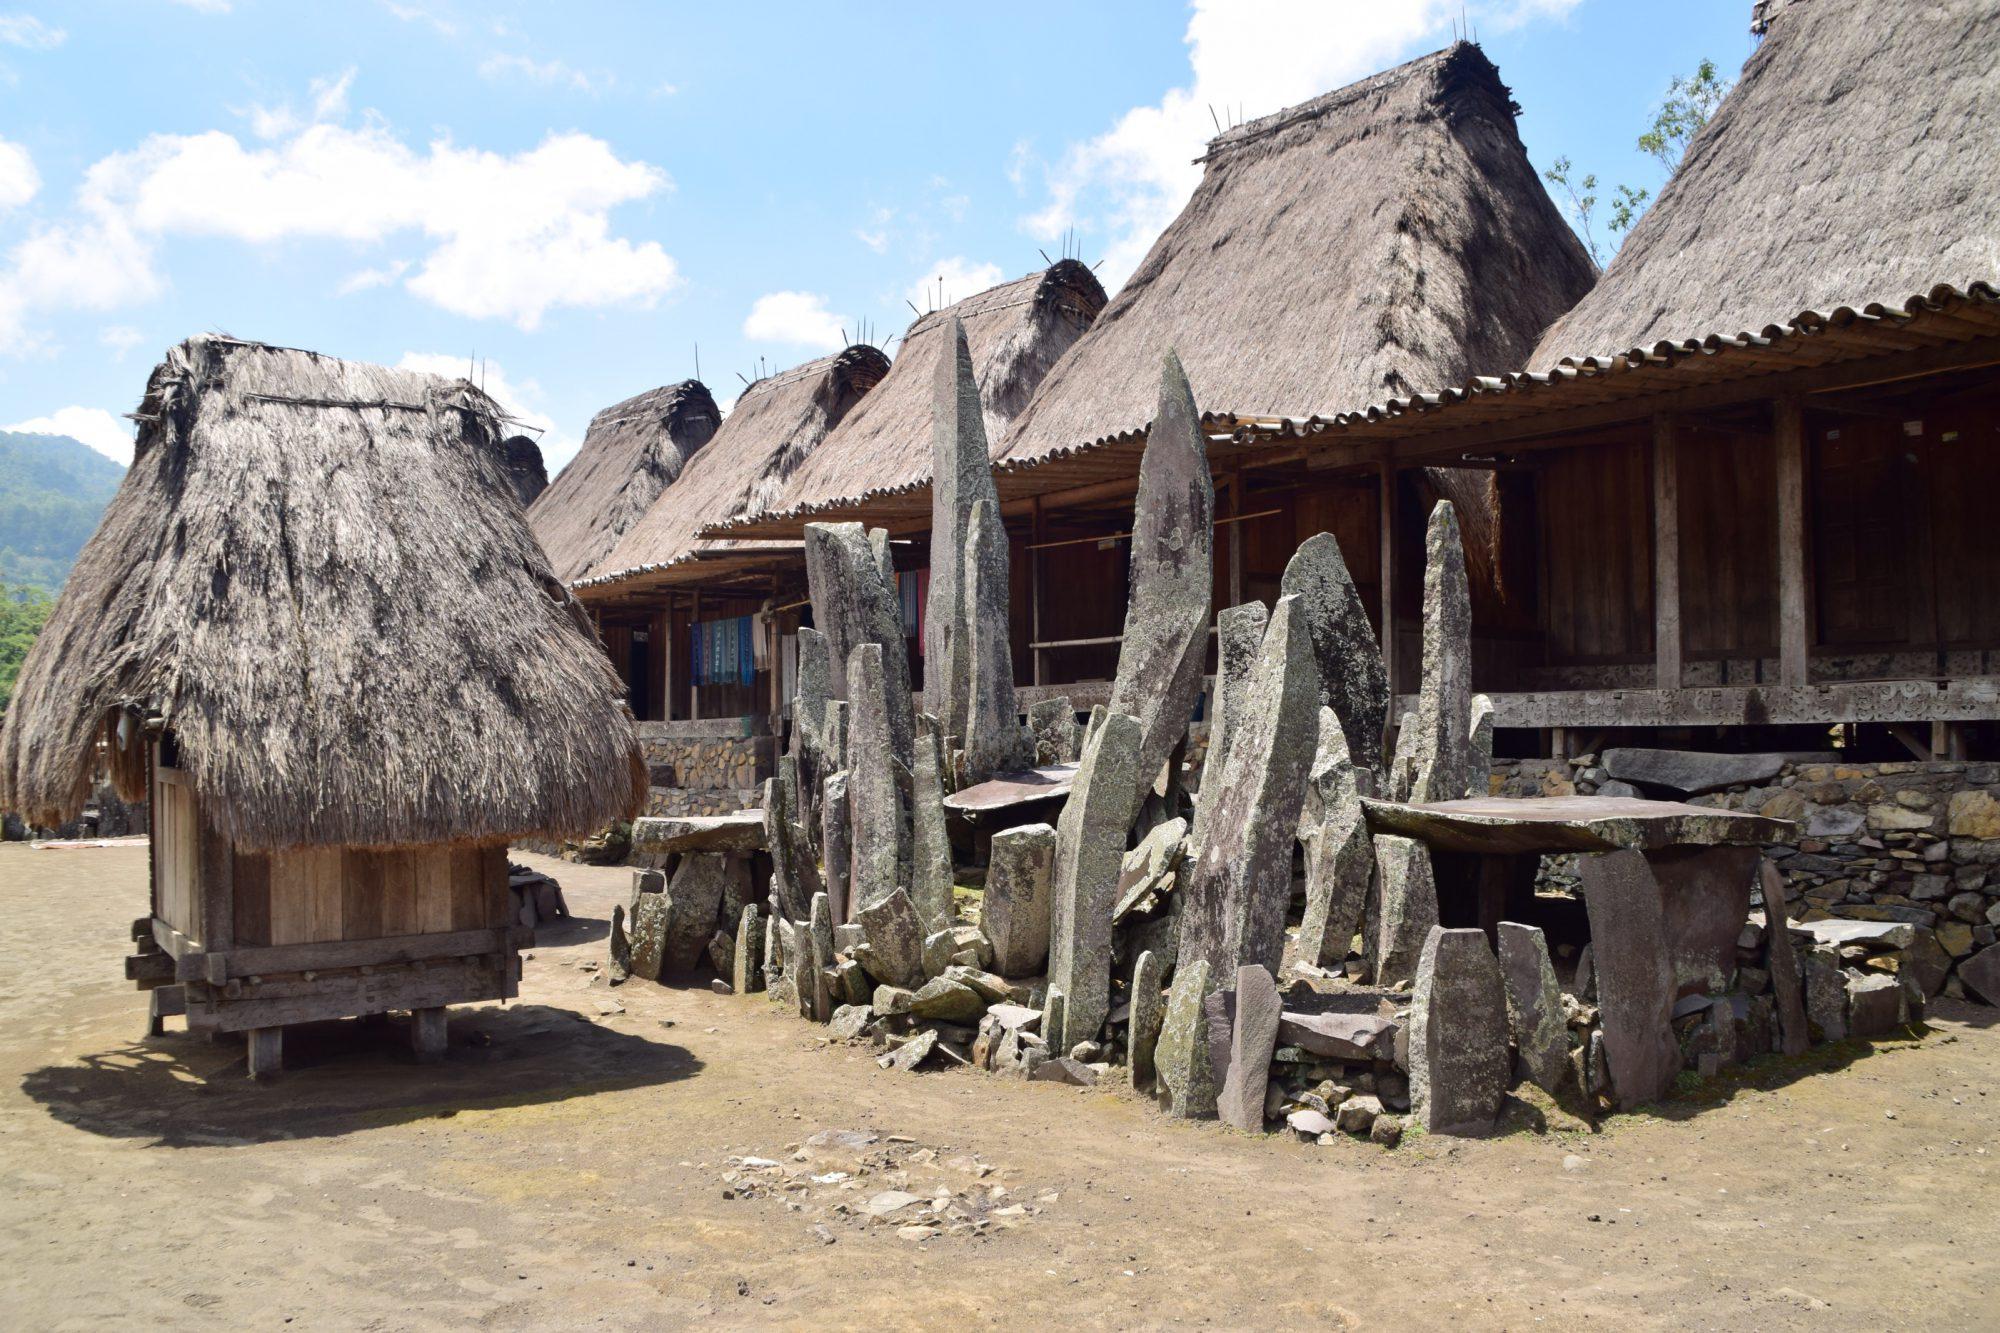 Bena Traditional Village, Flores, Indonesia